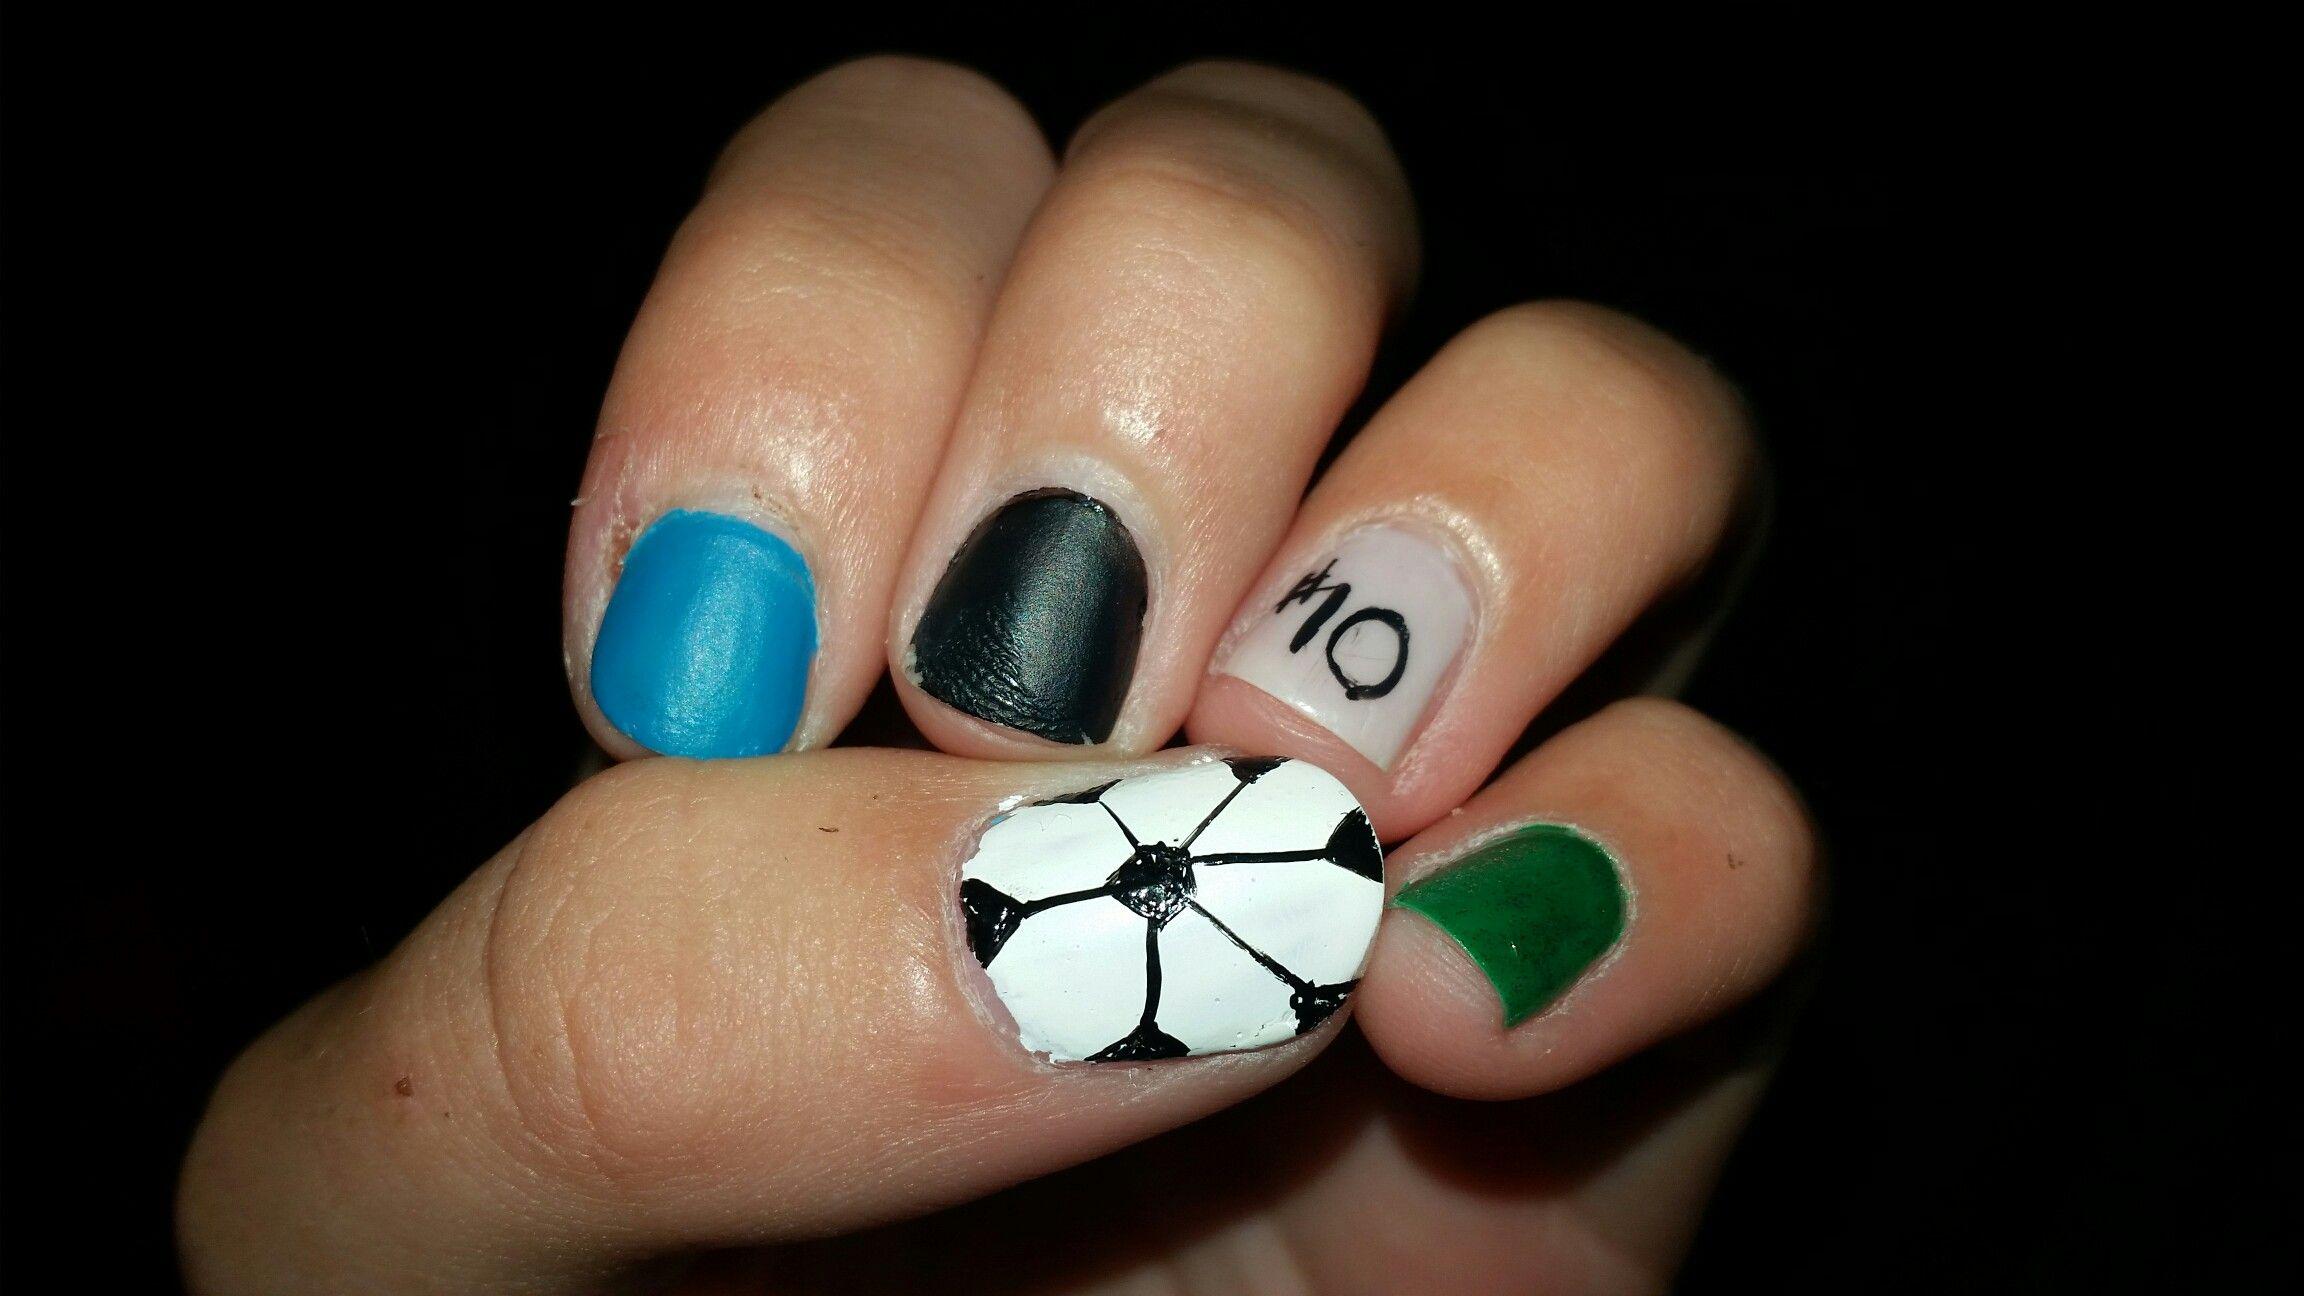 Pin by samantha thompson on nail art pinterest